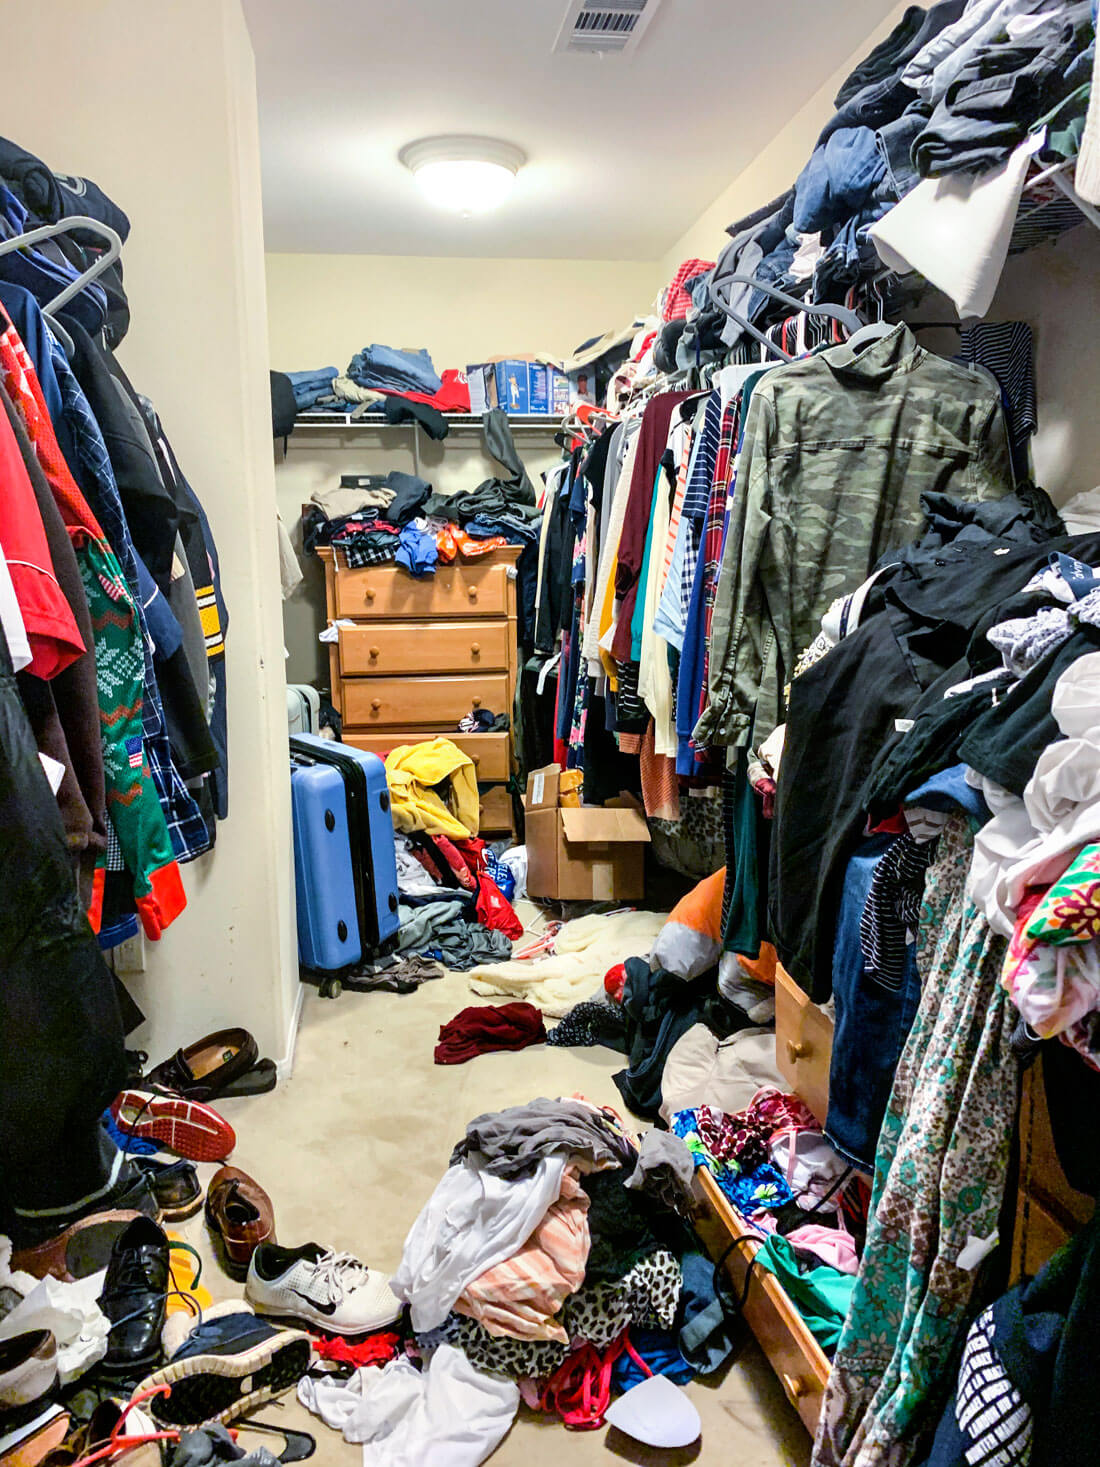 Closet organization ideas, the before